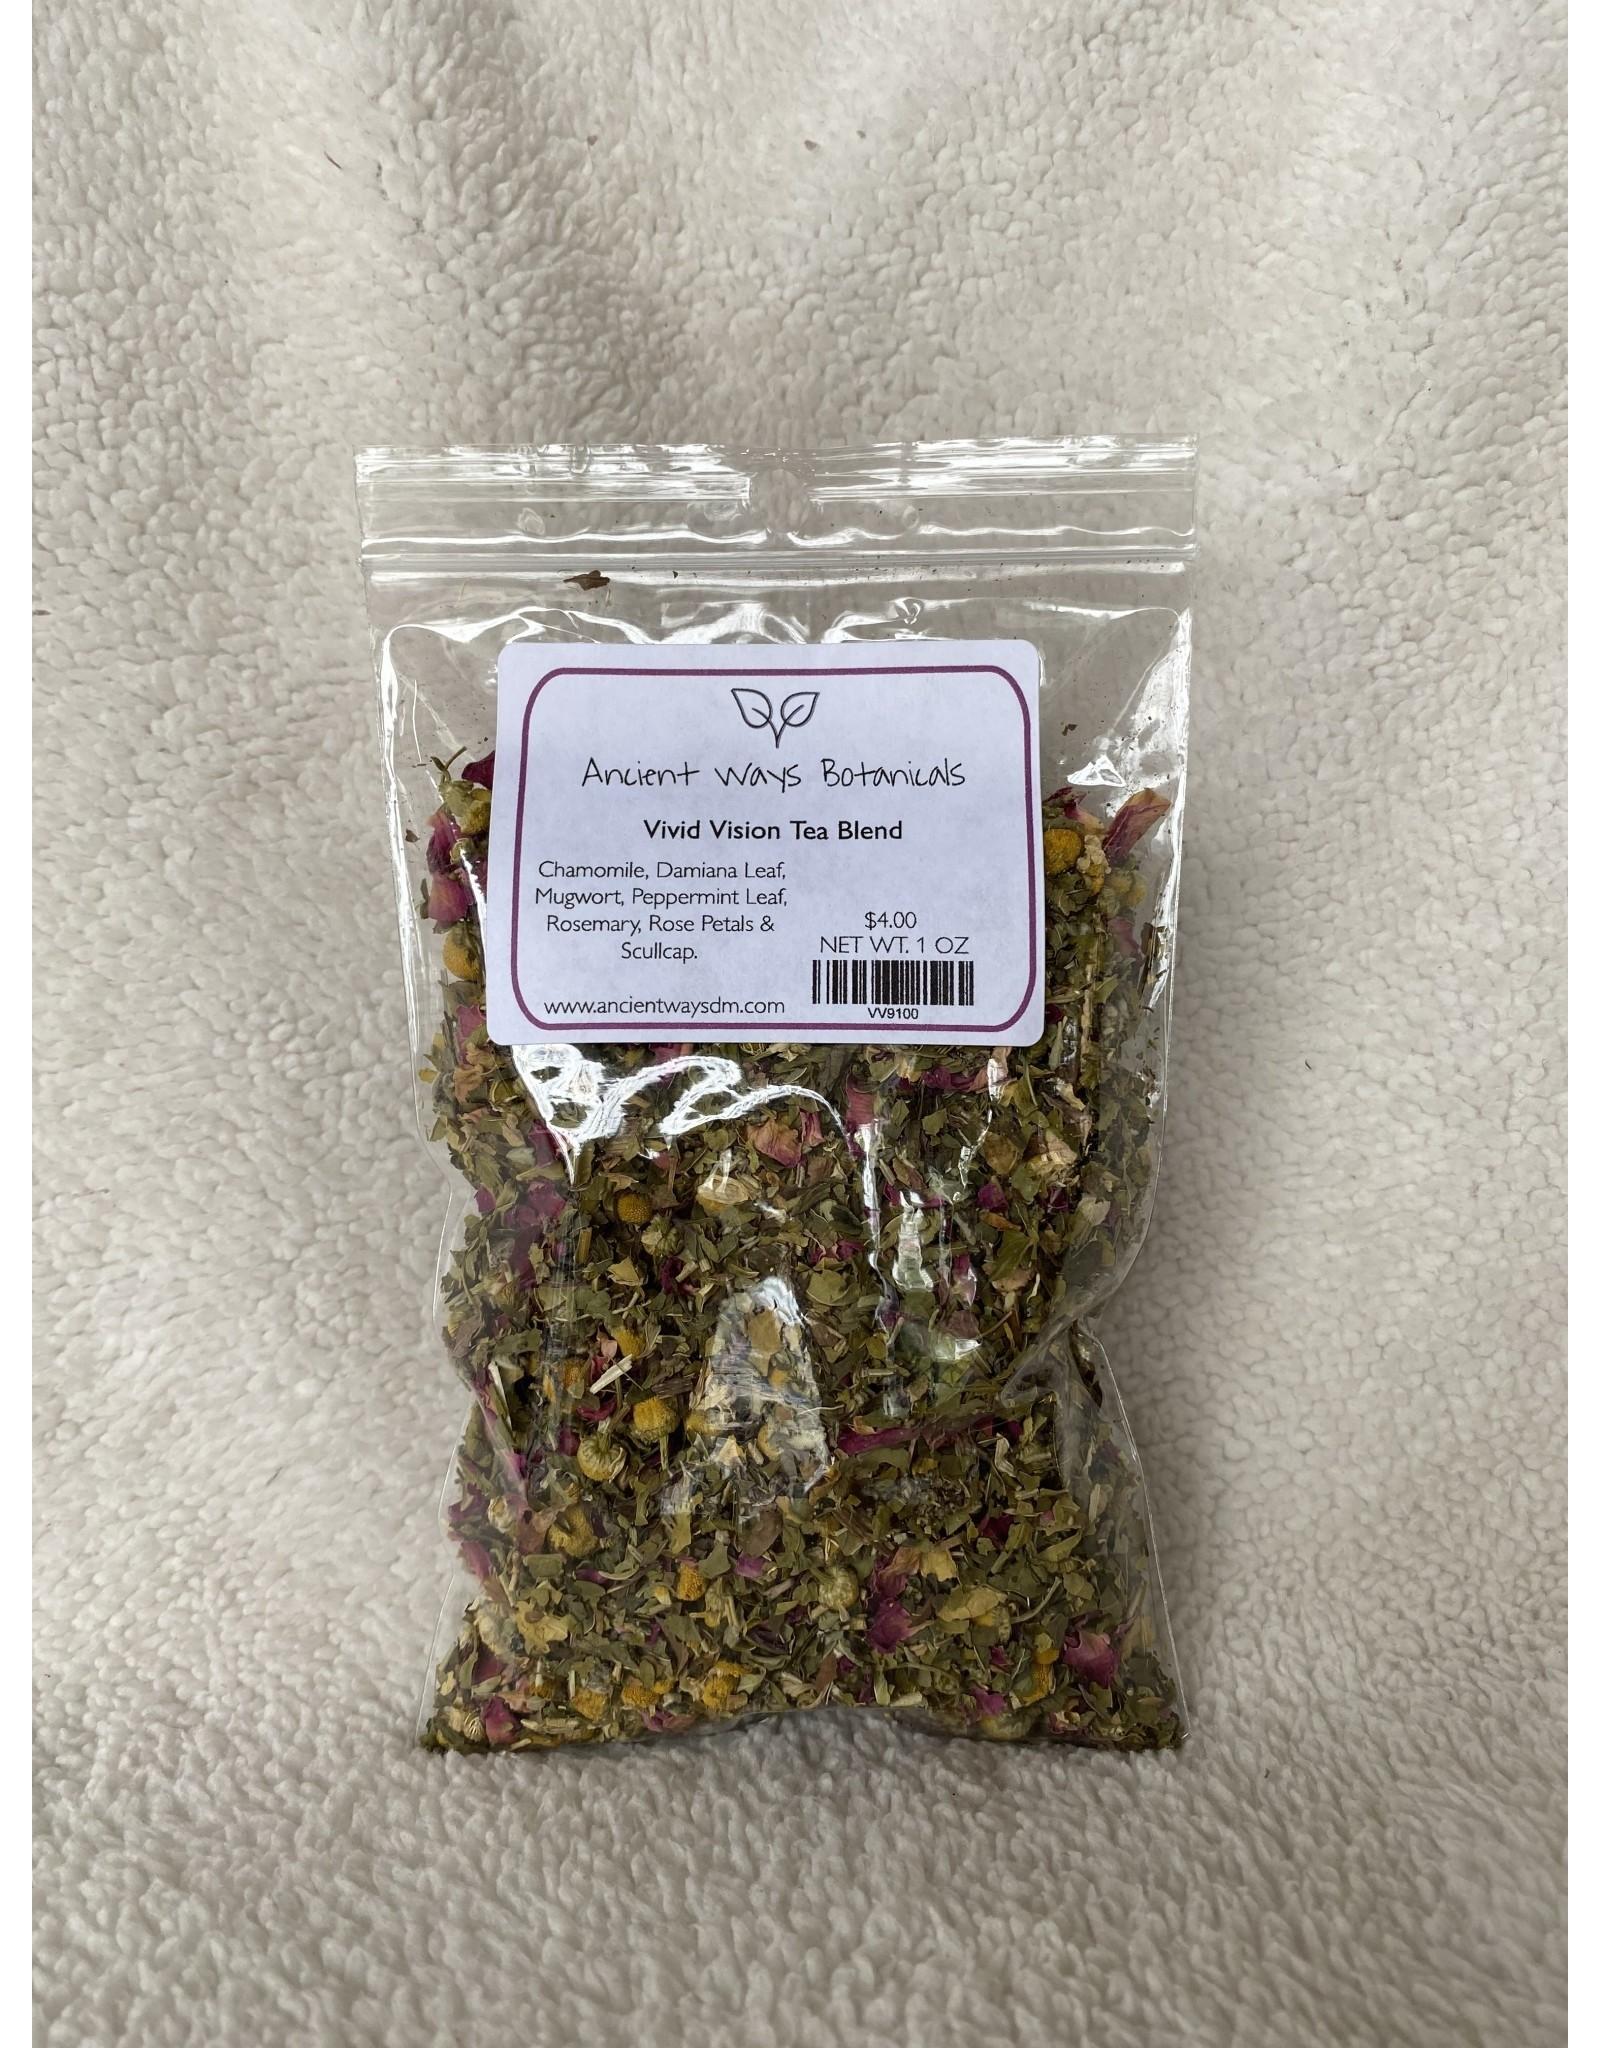 Vivid Vision Tea Blend -1 oz.